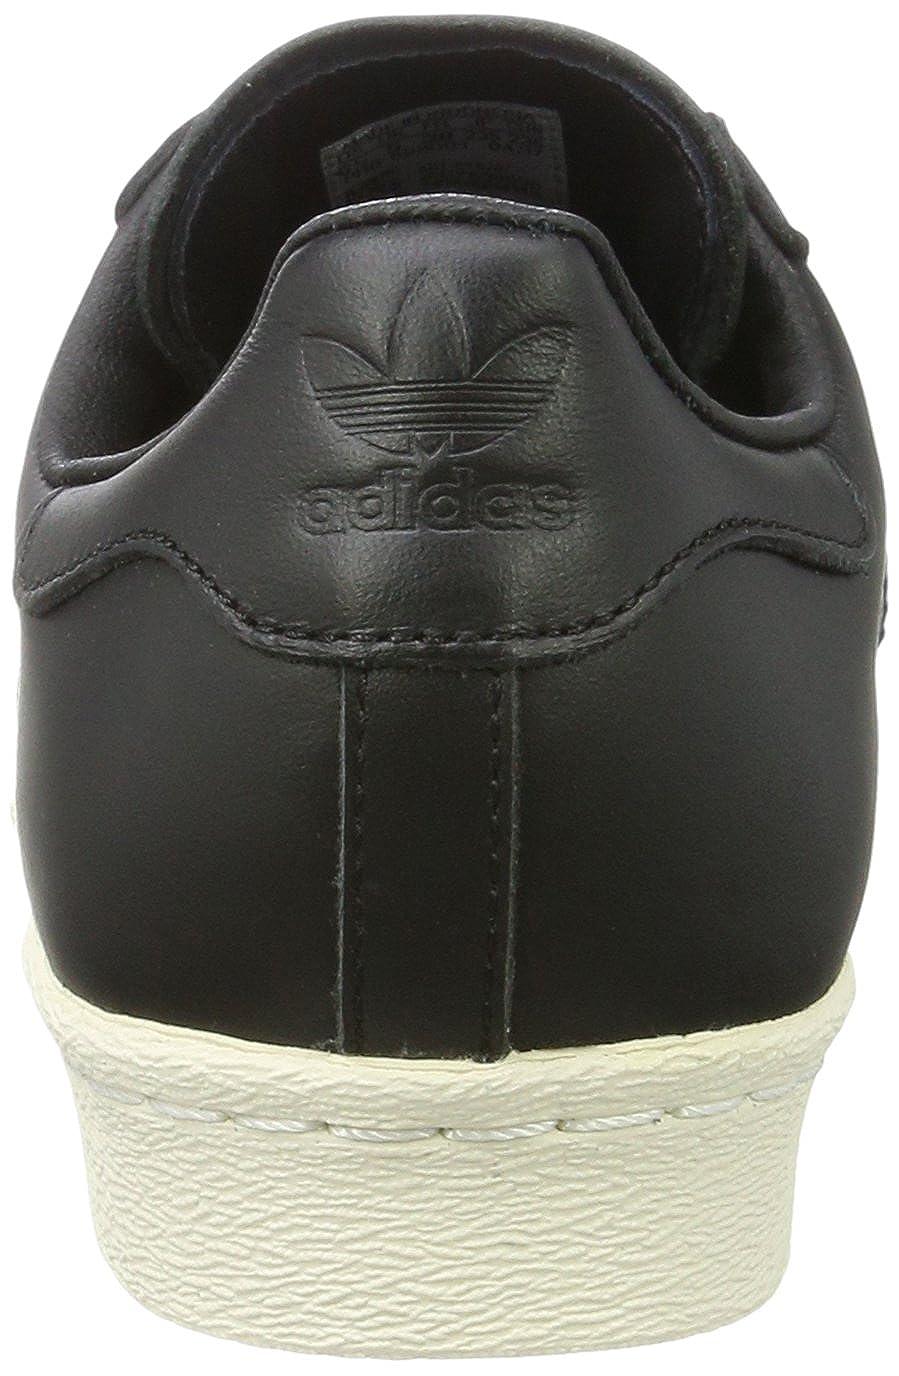 Adidas Damen Superstar 80s Cork Gymnastikschuhe Gymnastikschuhe Gymnastikschuhe 949c2a